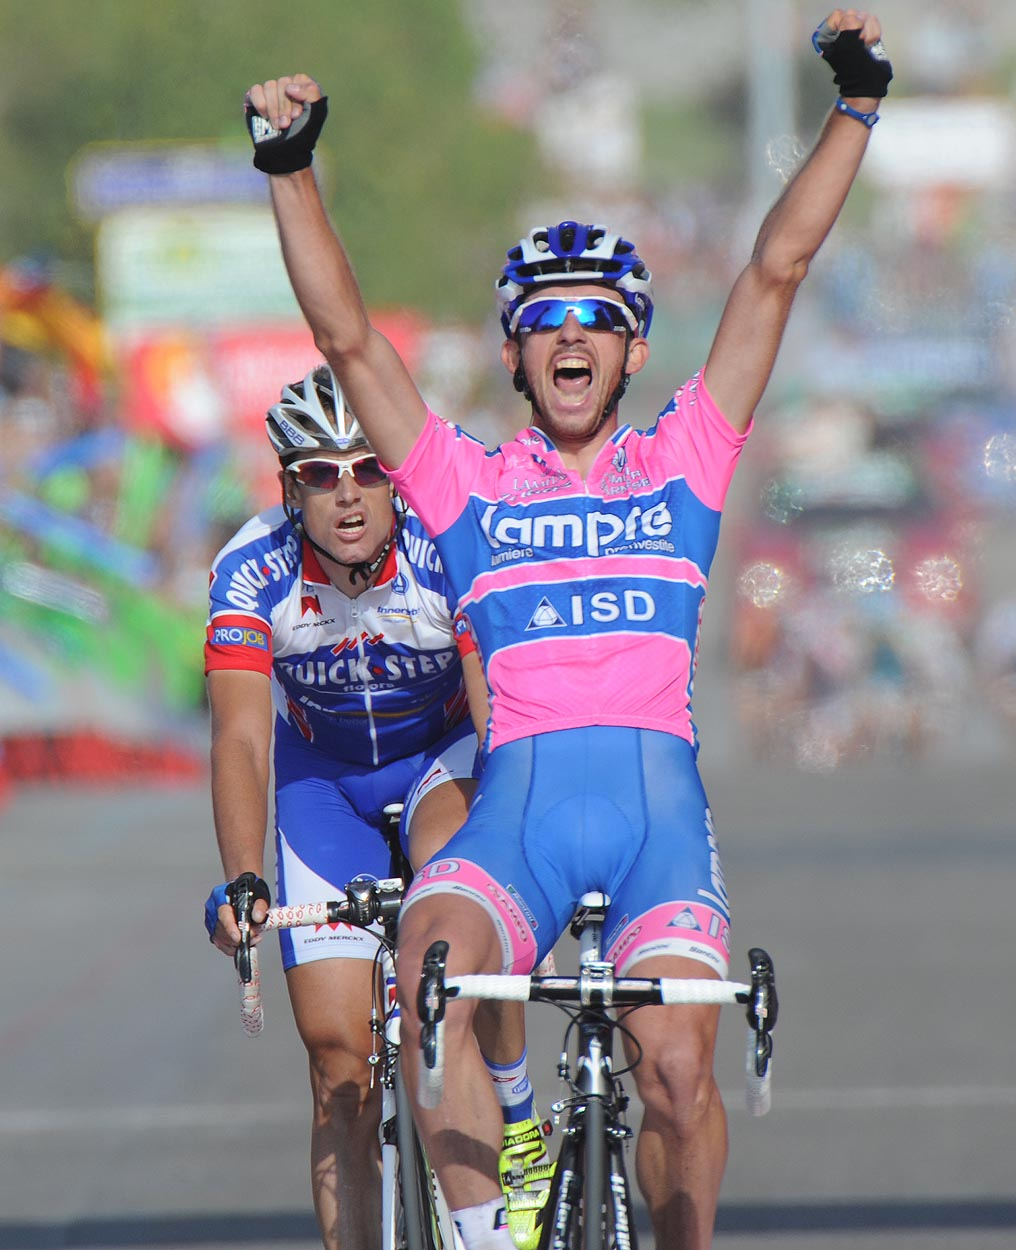 Francesco Gavazzi wins, Vuelta a Espana 2011, stage 18